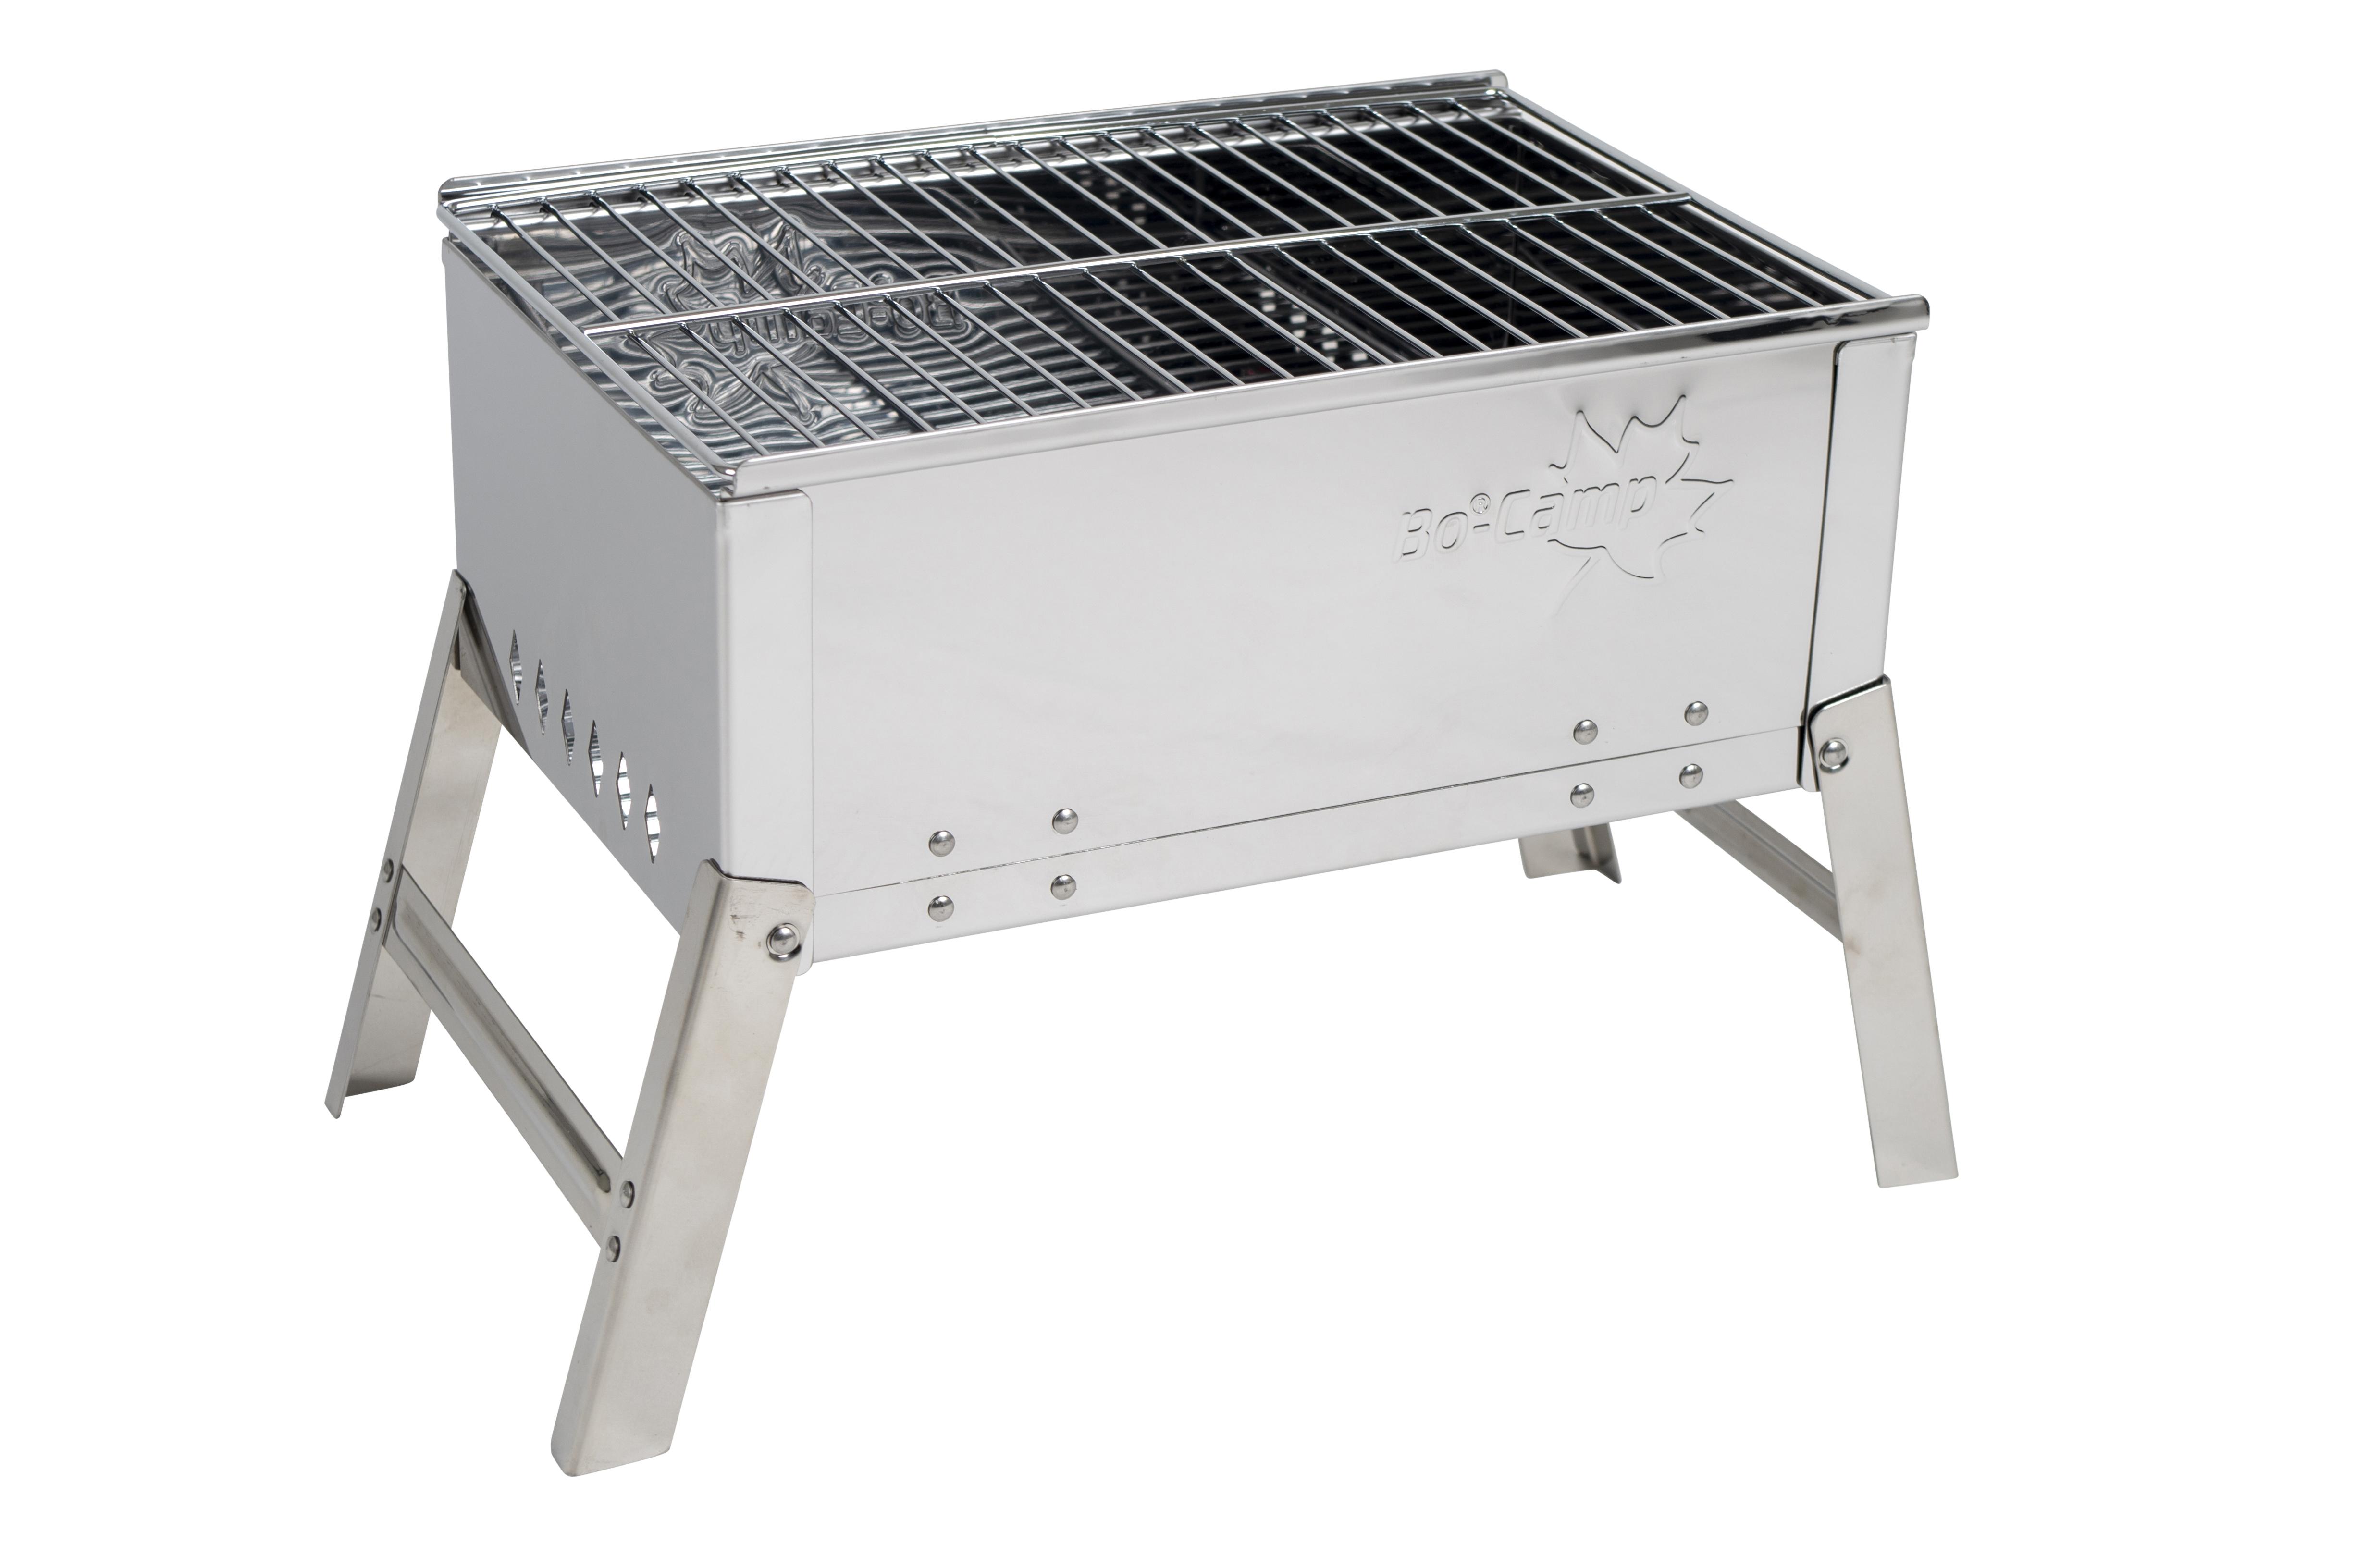 Bo-camp Barbecue Compact Deluxe Rvs